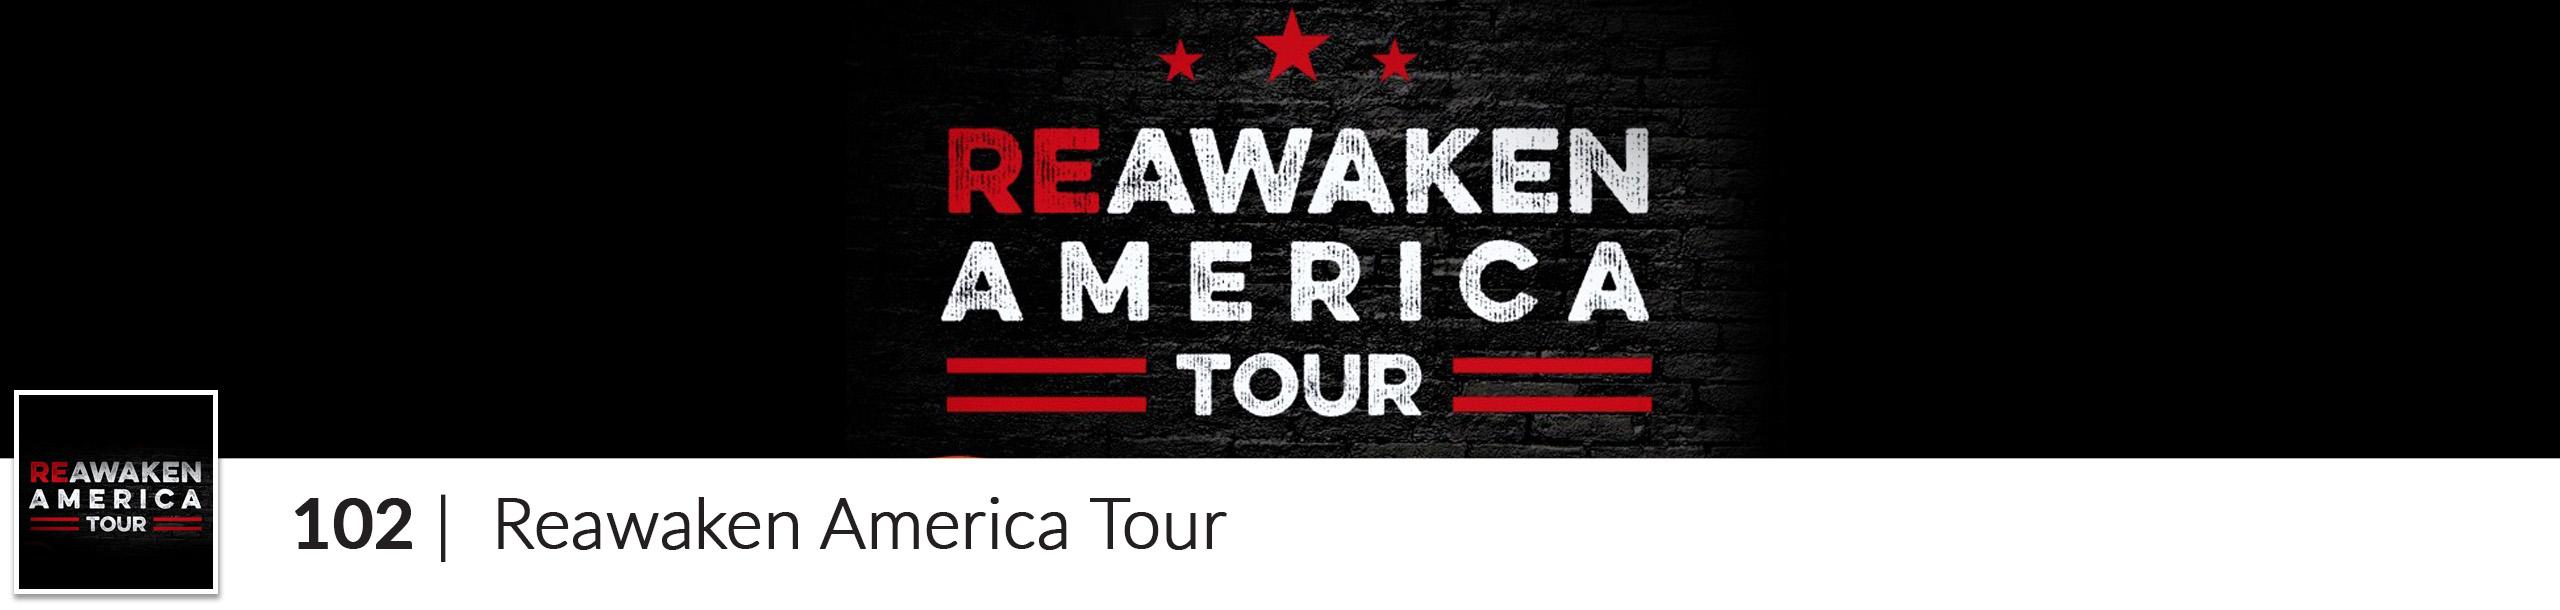 reawaken_america-header01